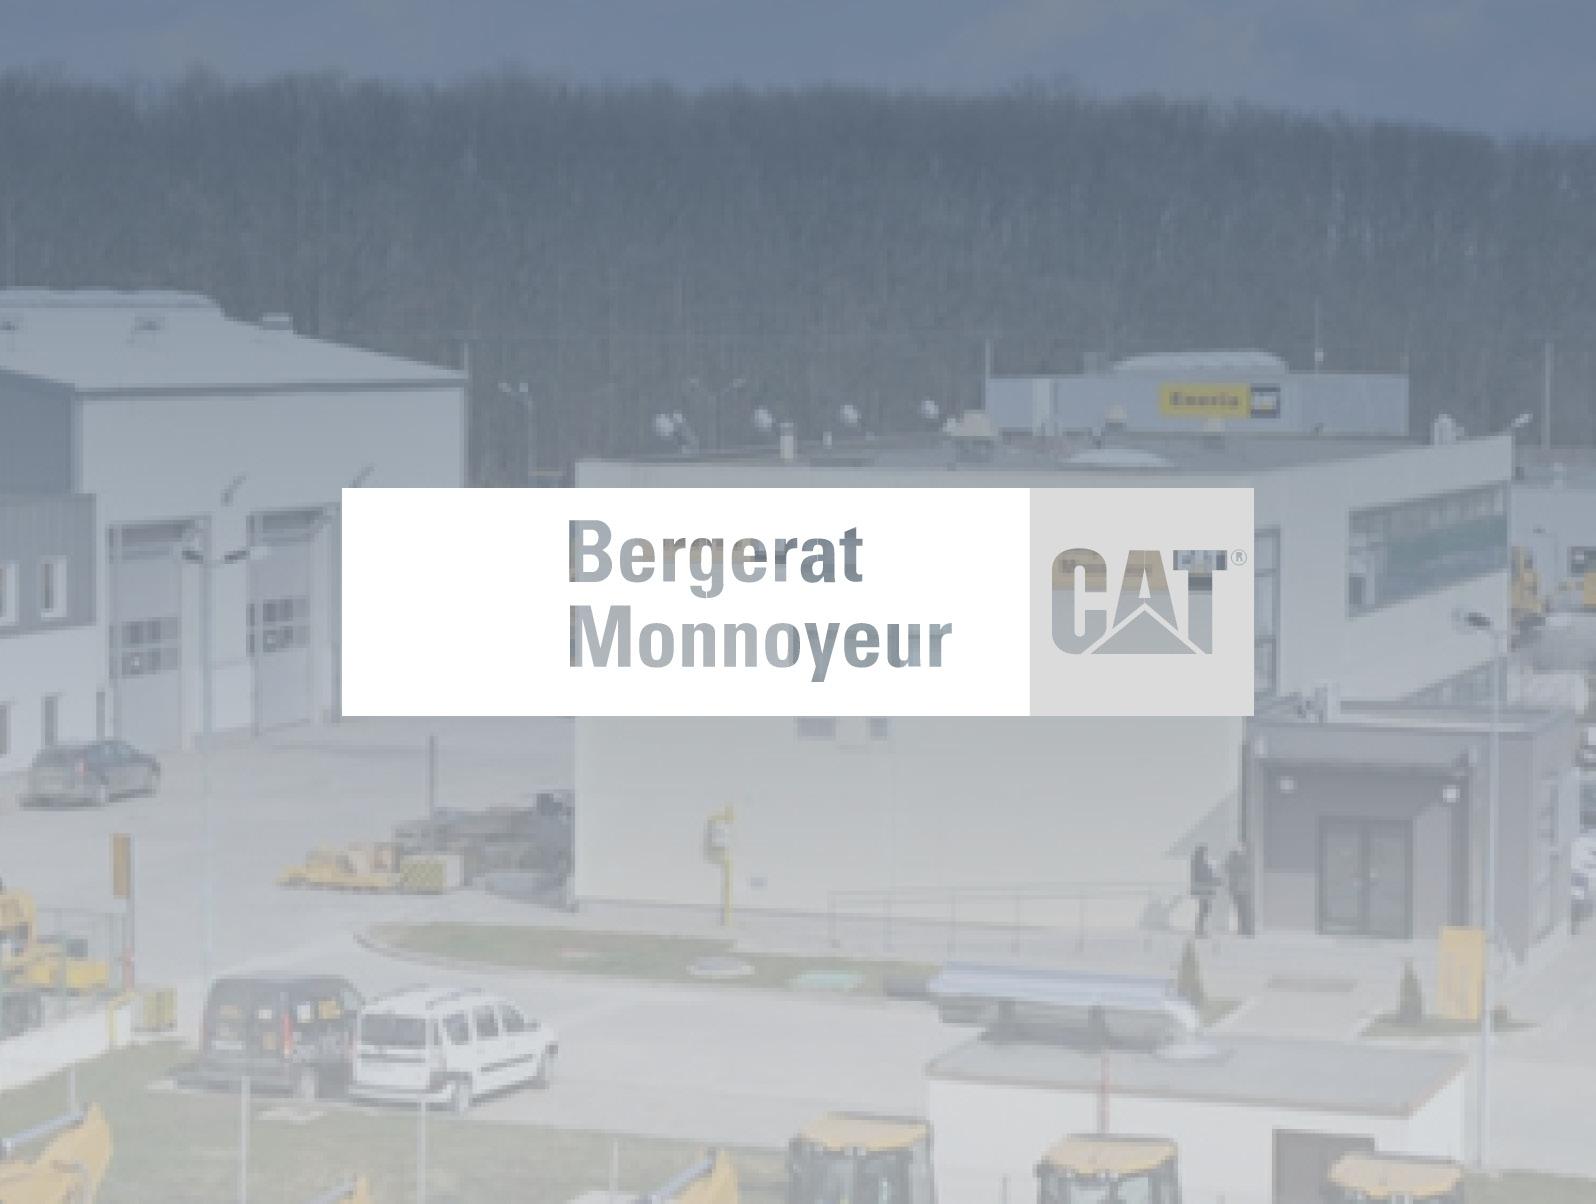 bergerat monnoyeur-Customer Pages